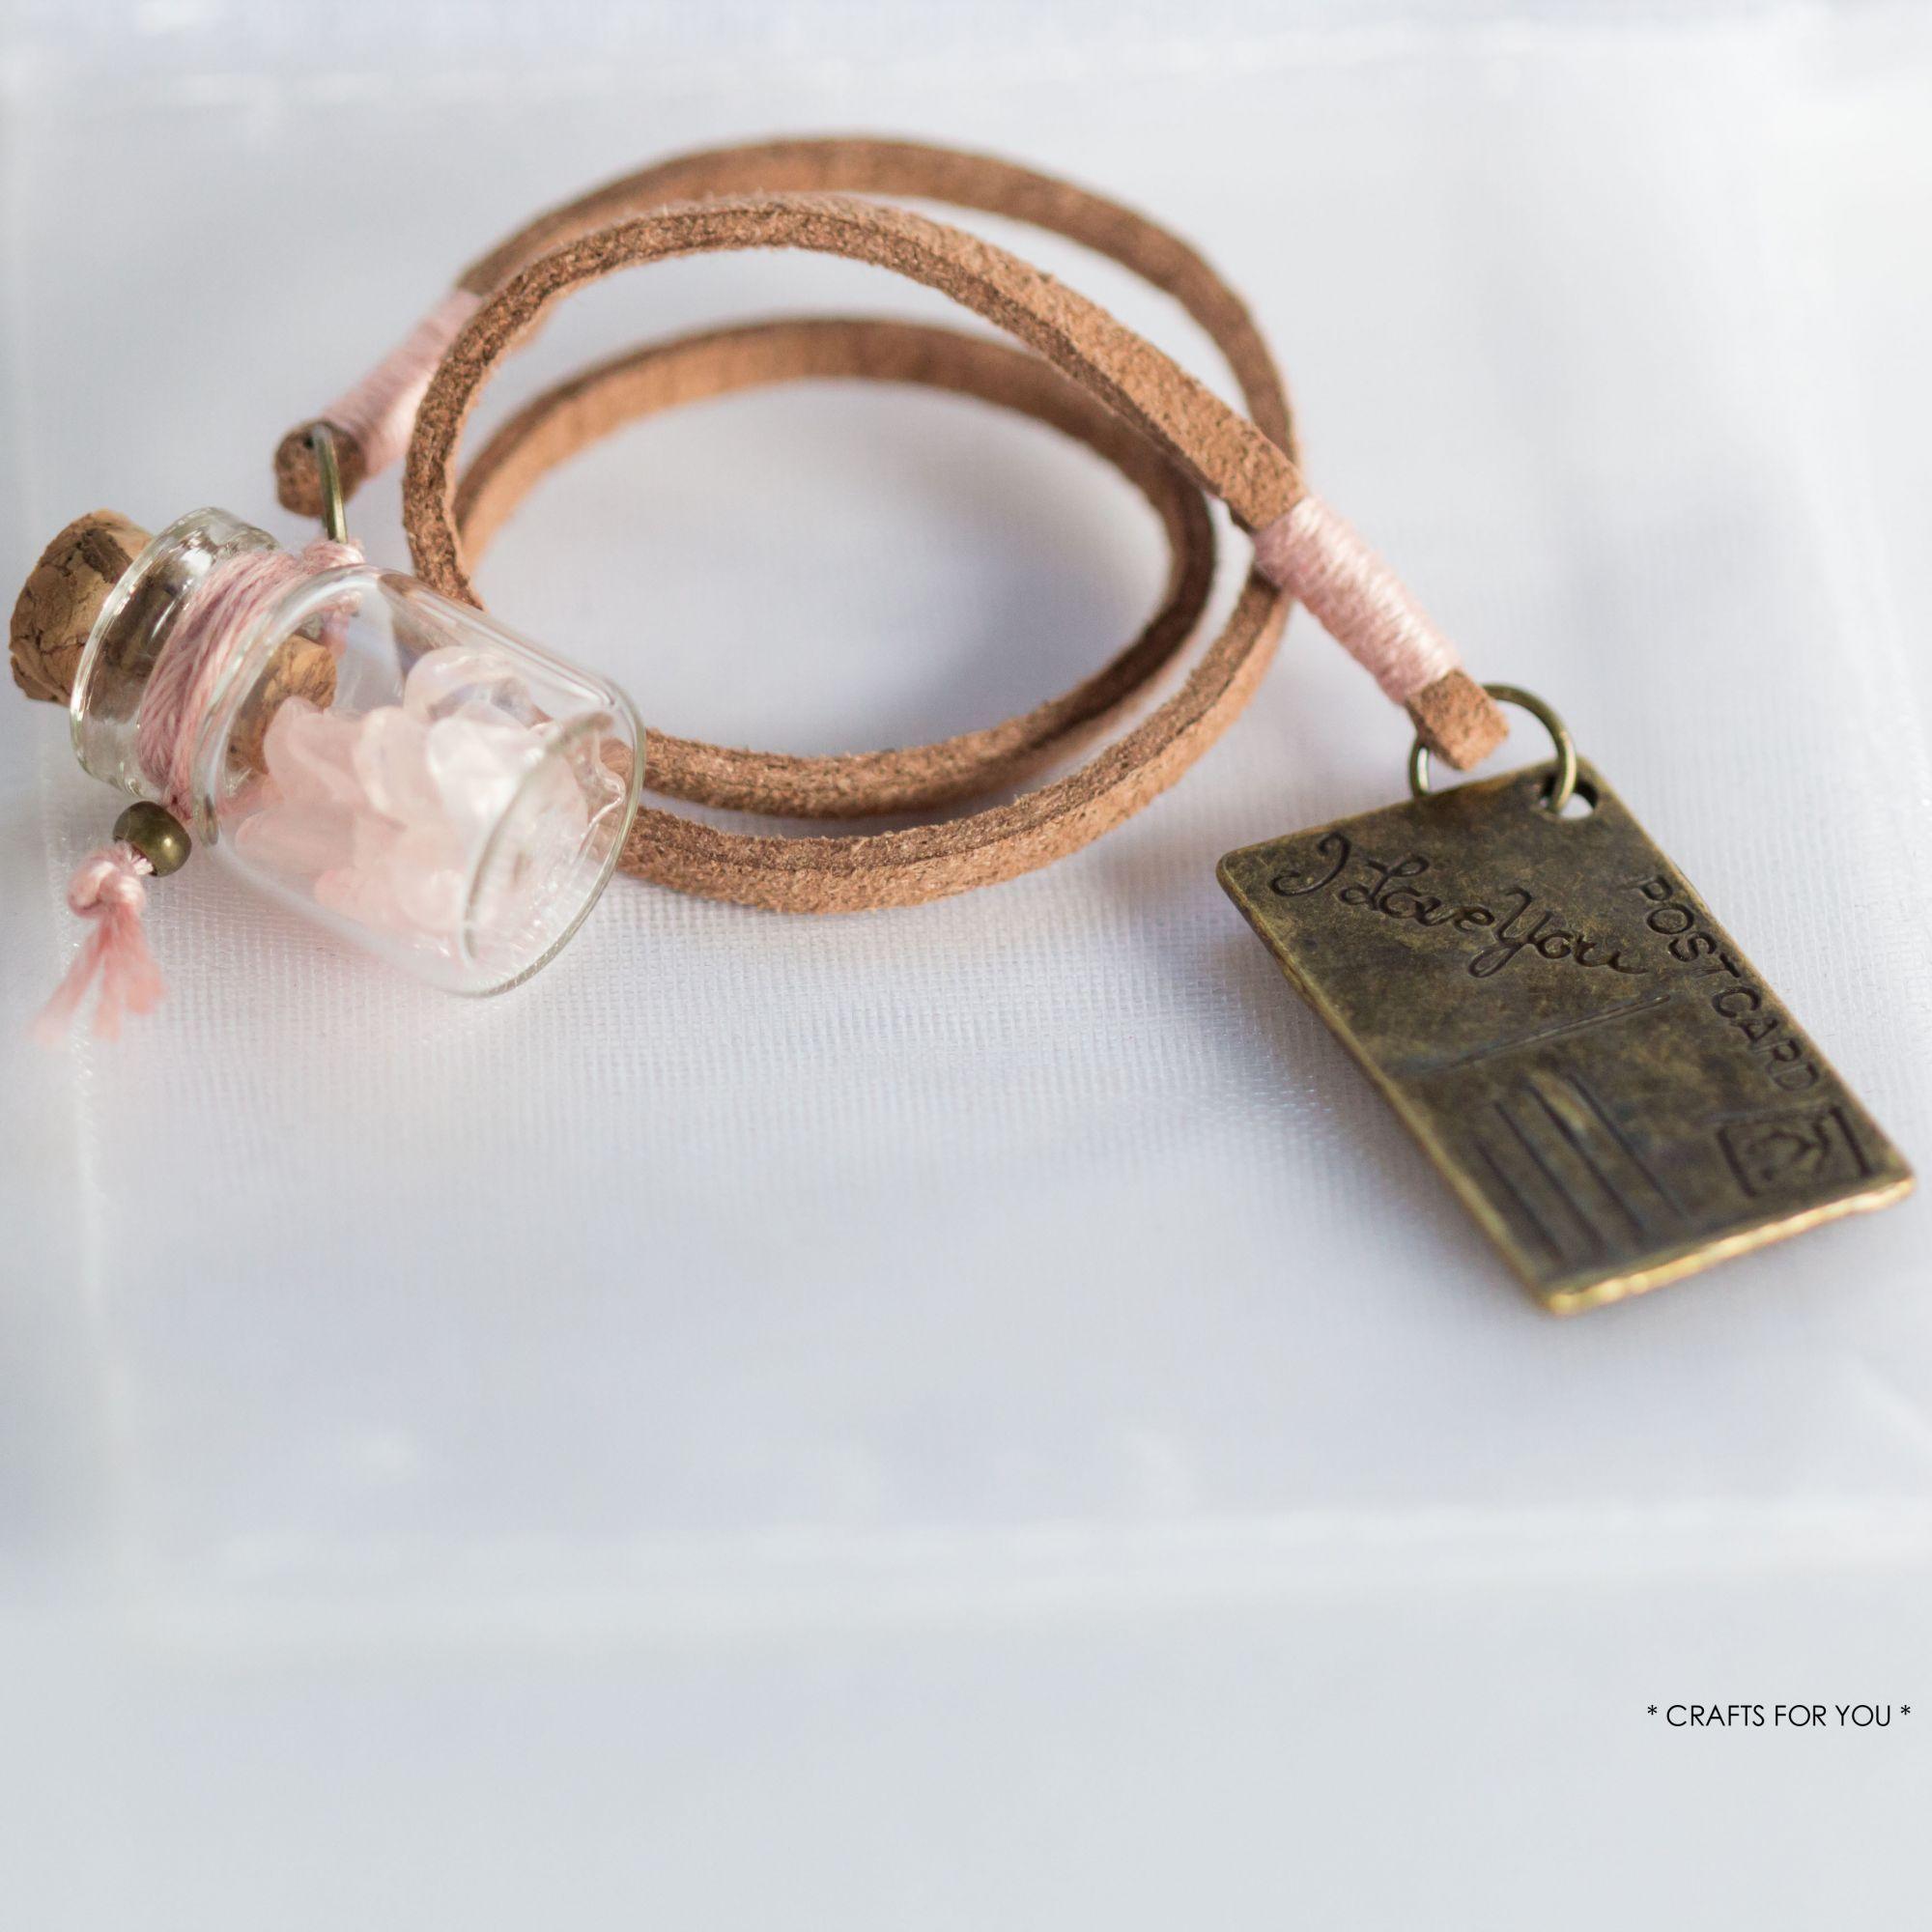 Mini-bottle with rose quartz chips & postcard-Status: available.